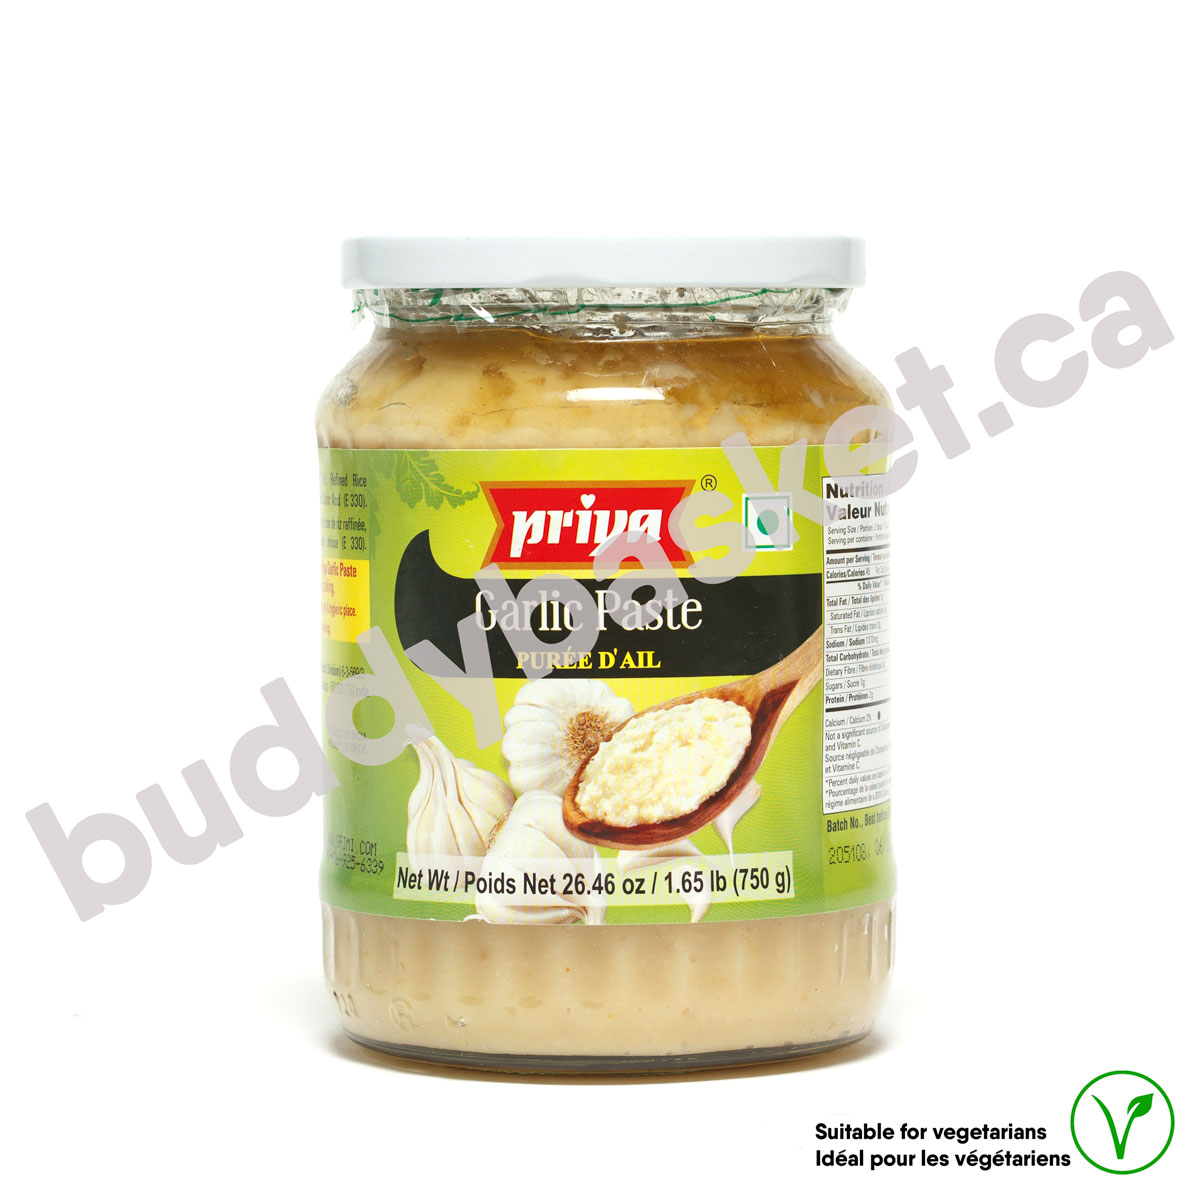 Priya Garlic Paste 750g